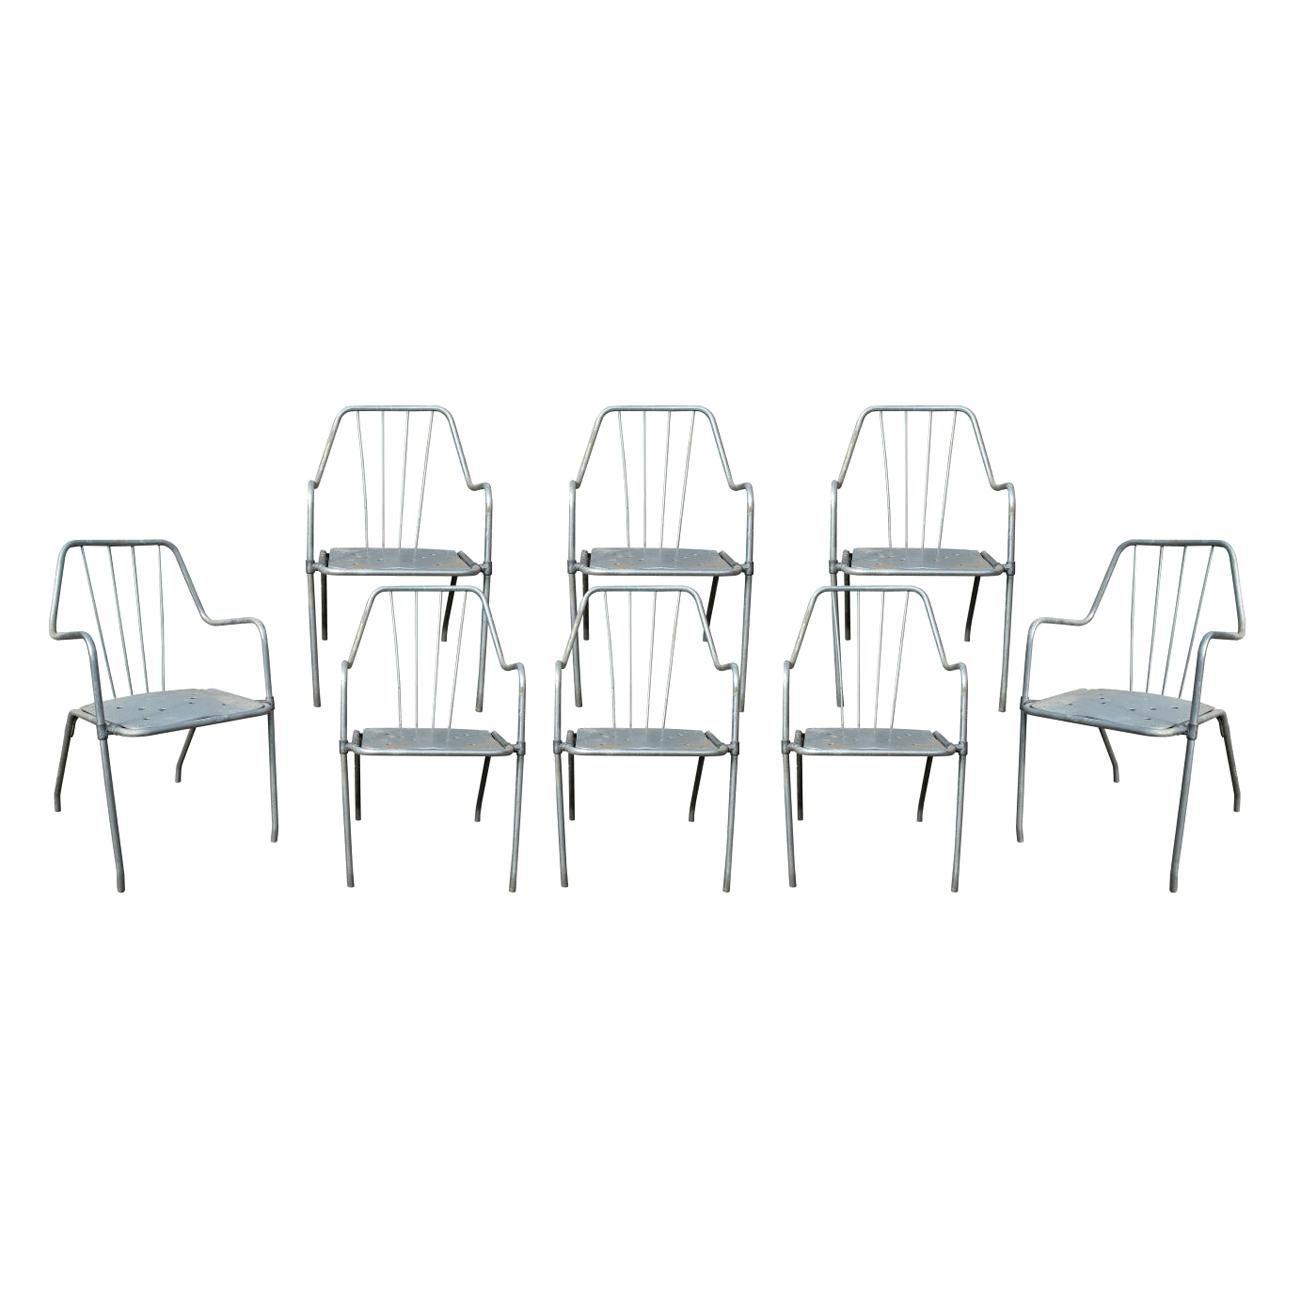 1970s Set of Eight Spanish Iron Garden Chairs in Steel Finish